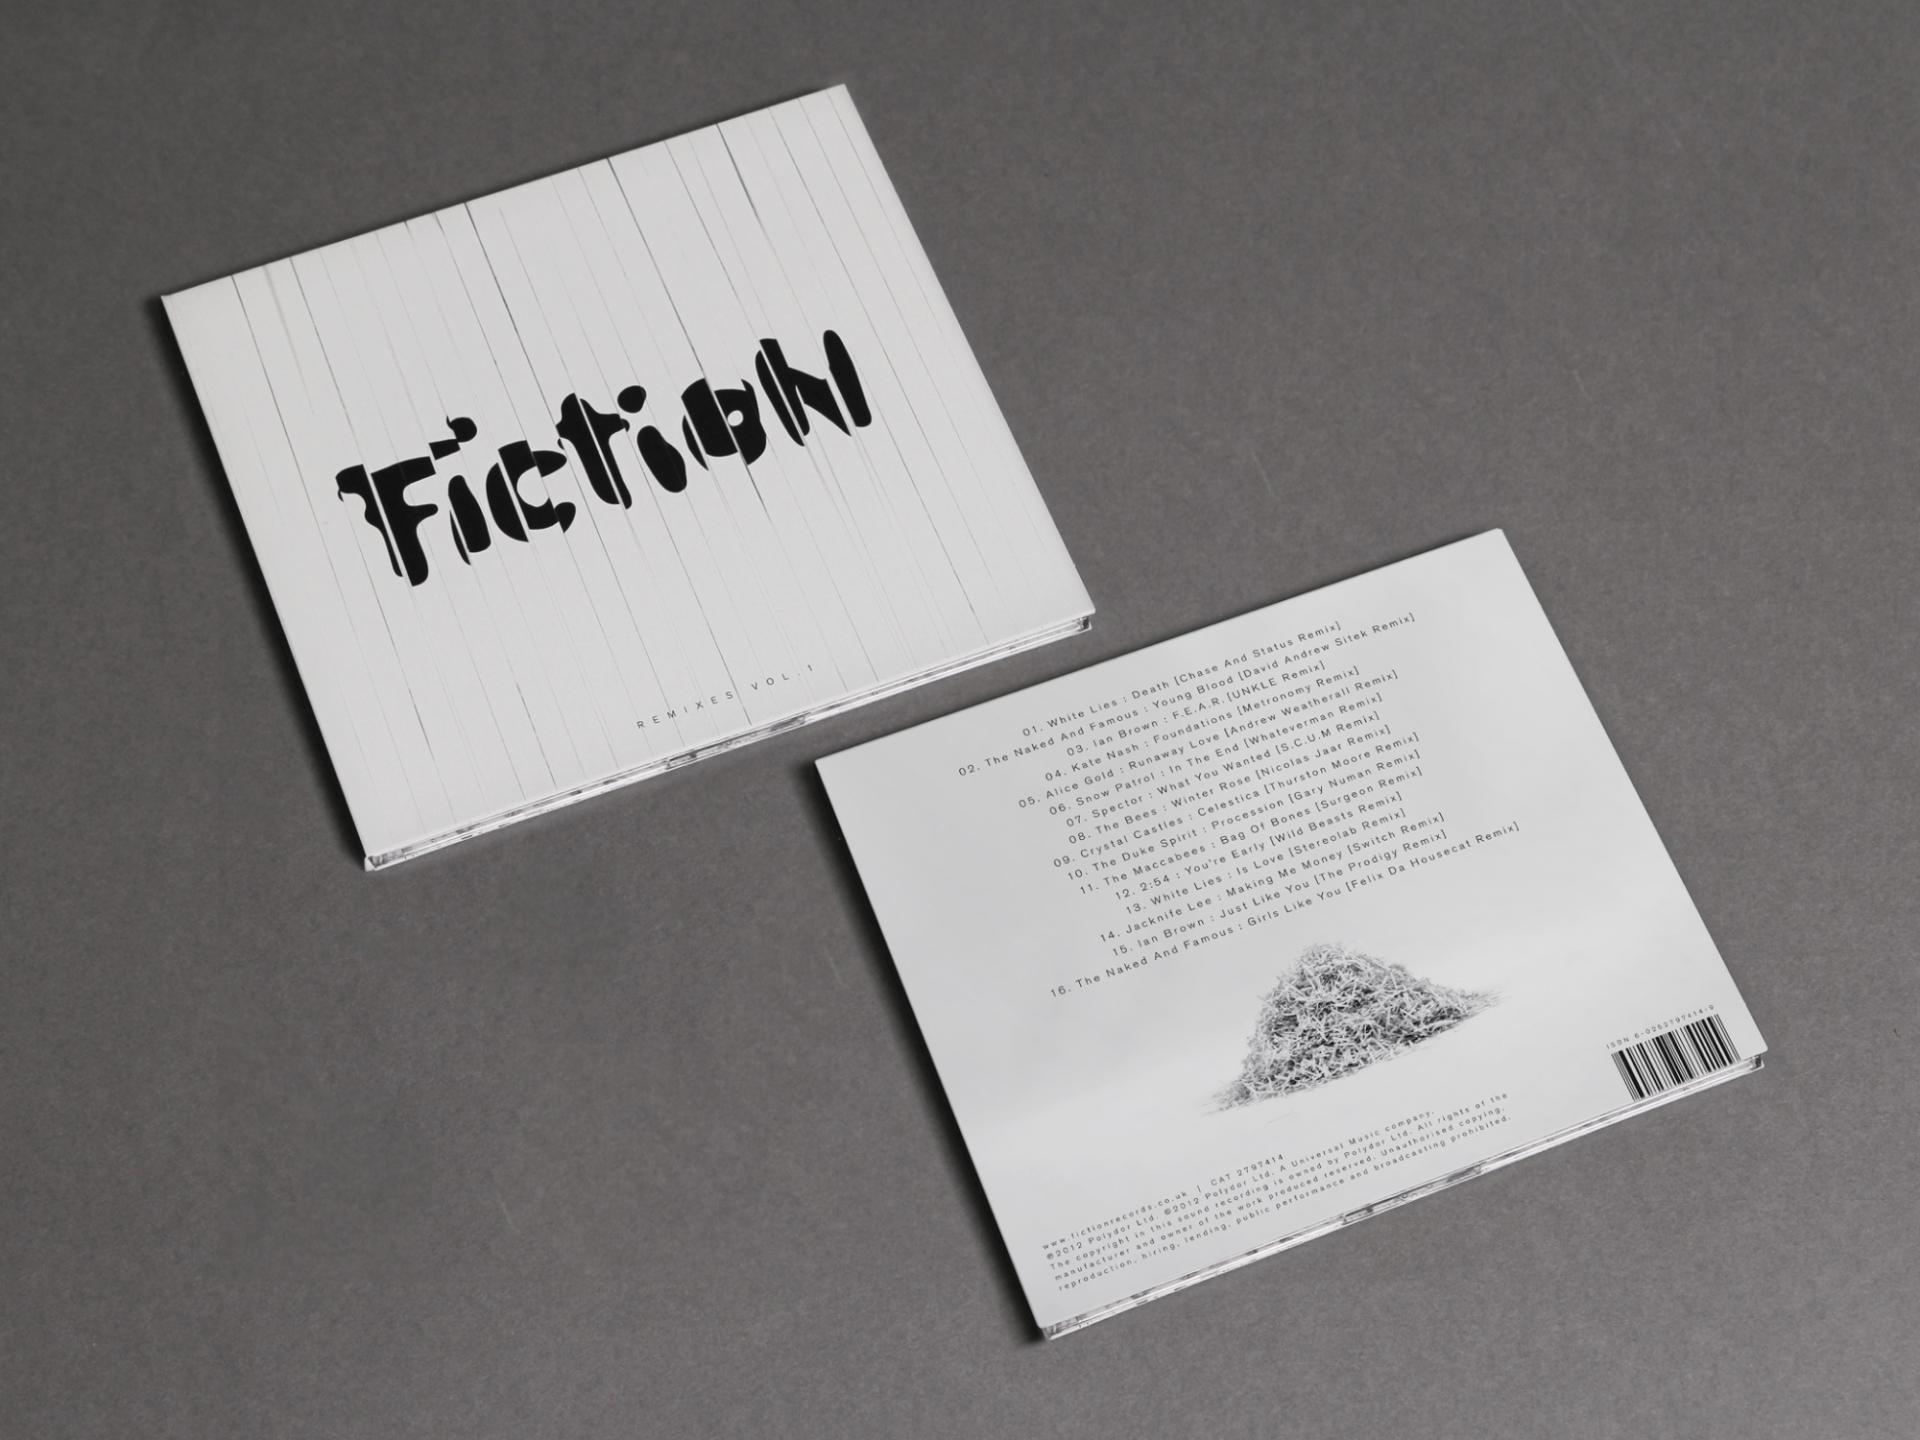 Patrick Fry Studio Fiction Remixes